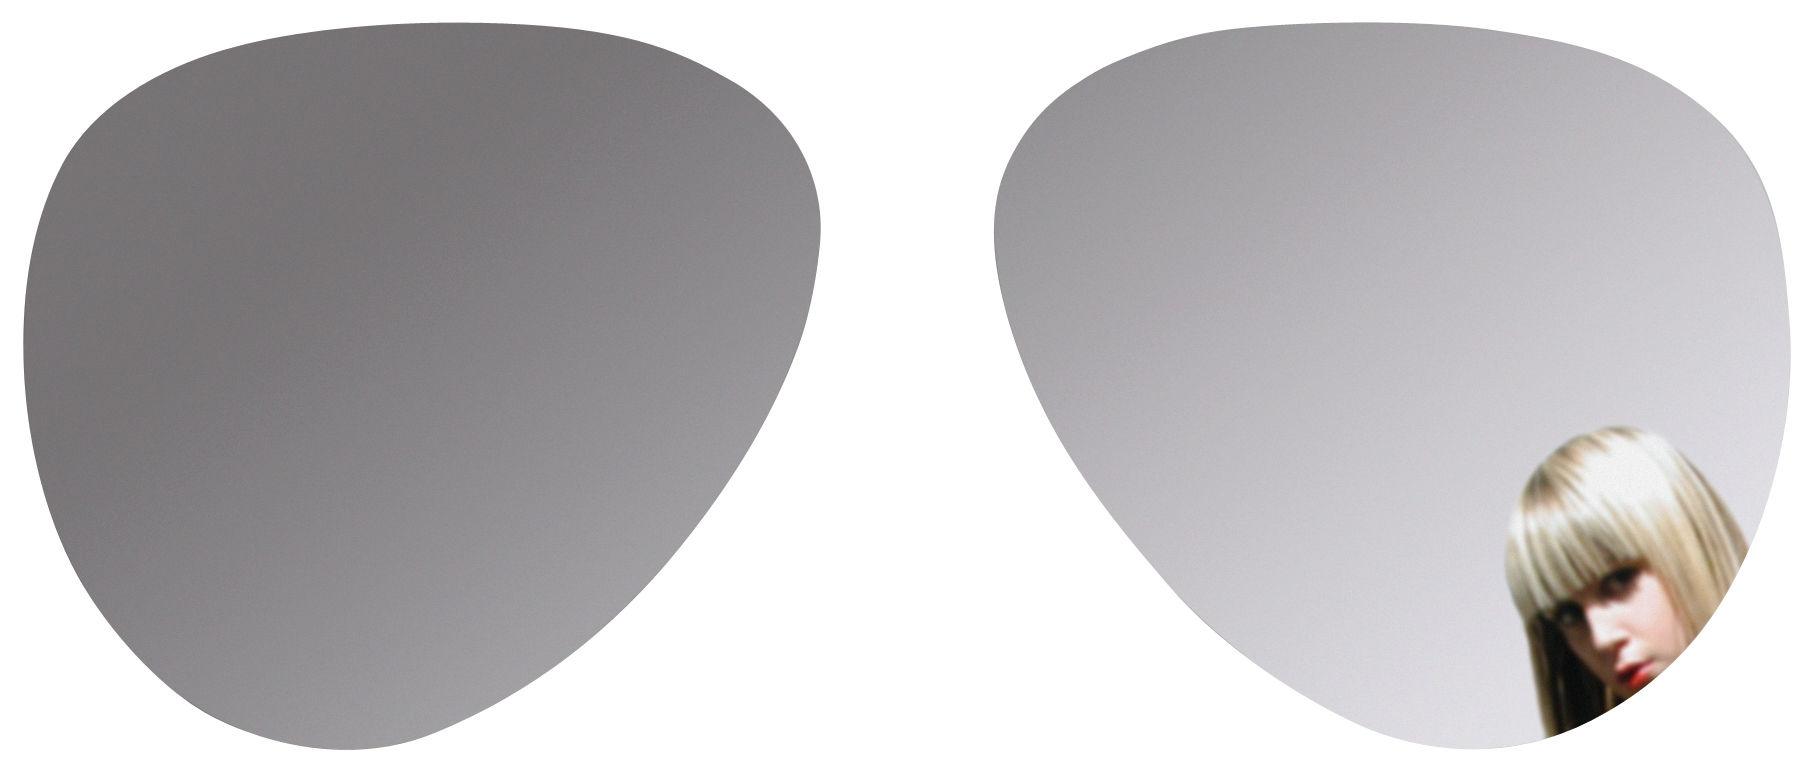 Mobilier - Miroirs - Miroir autocollant Aviator - Domestic - Miroir - Perspex